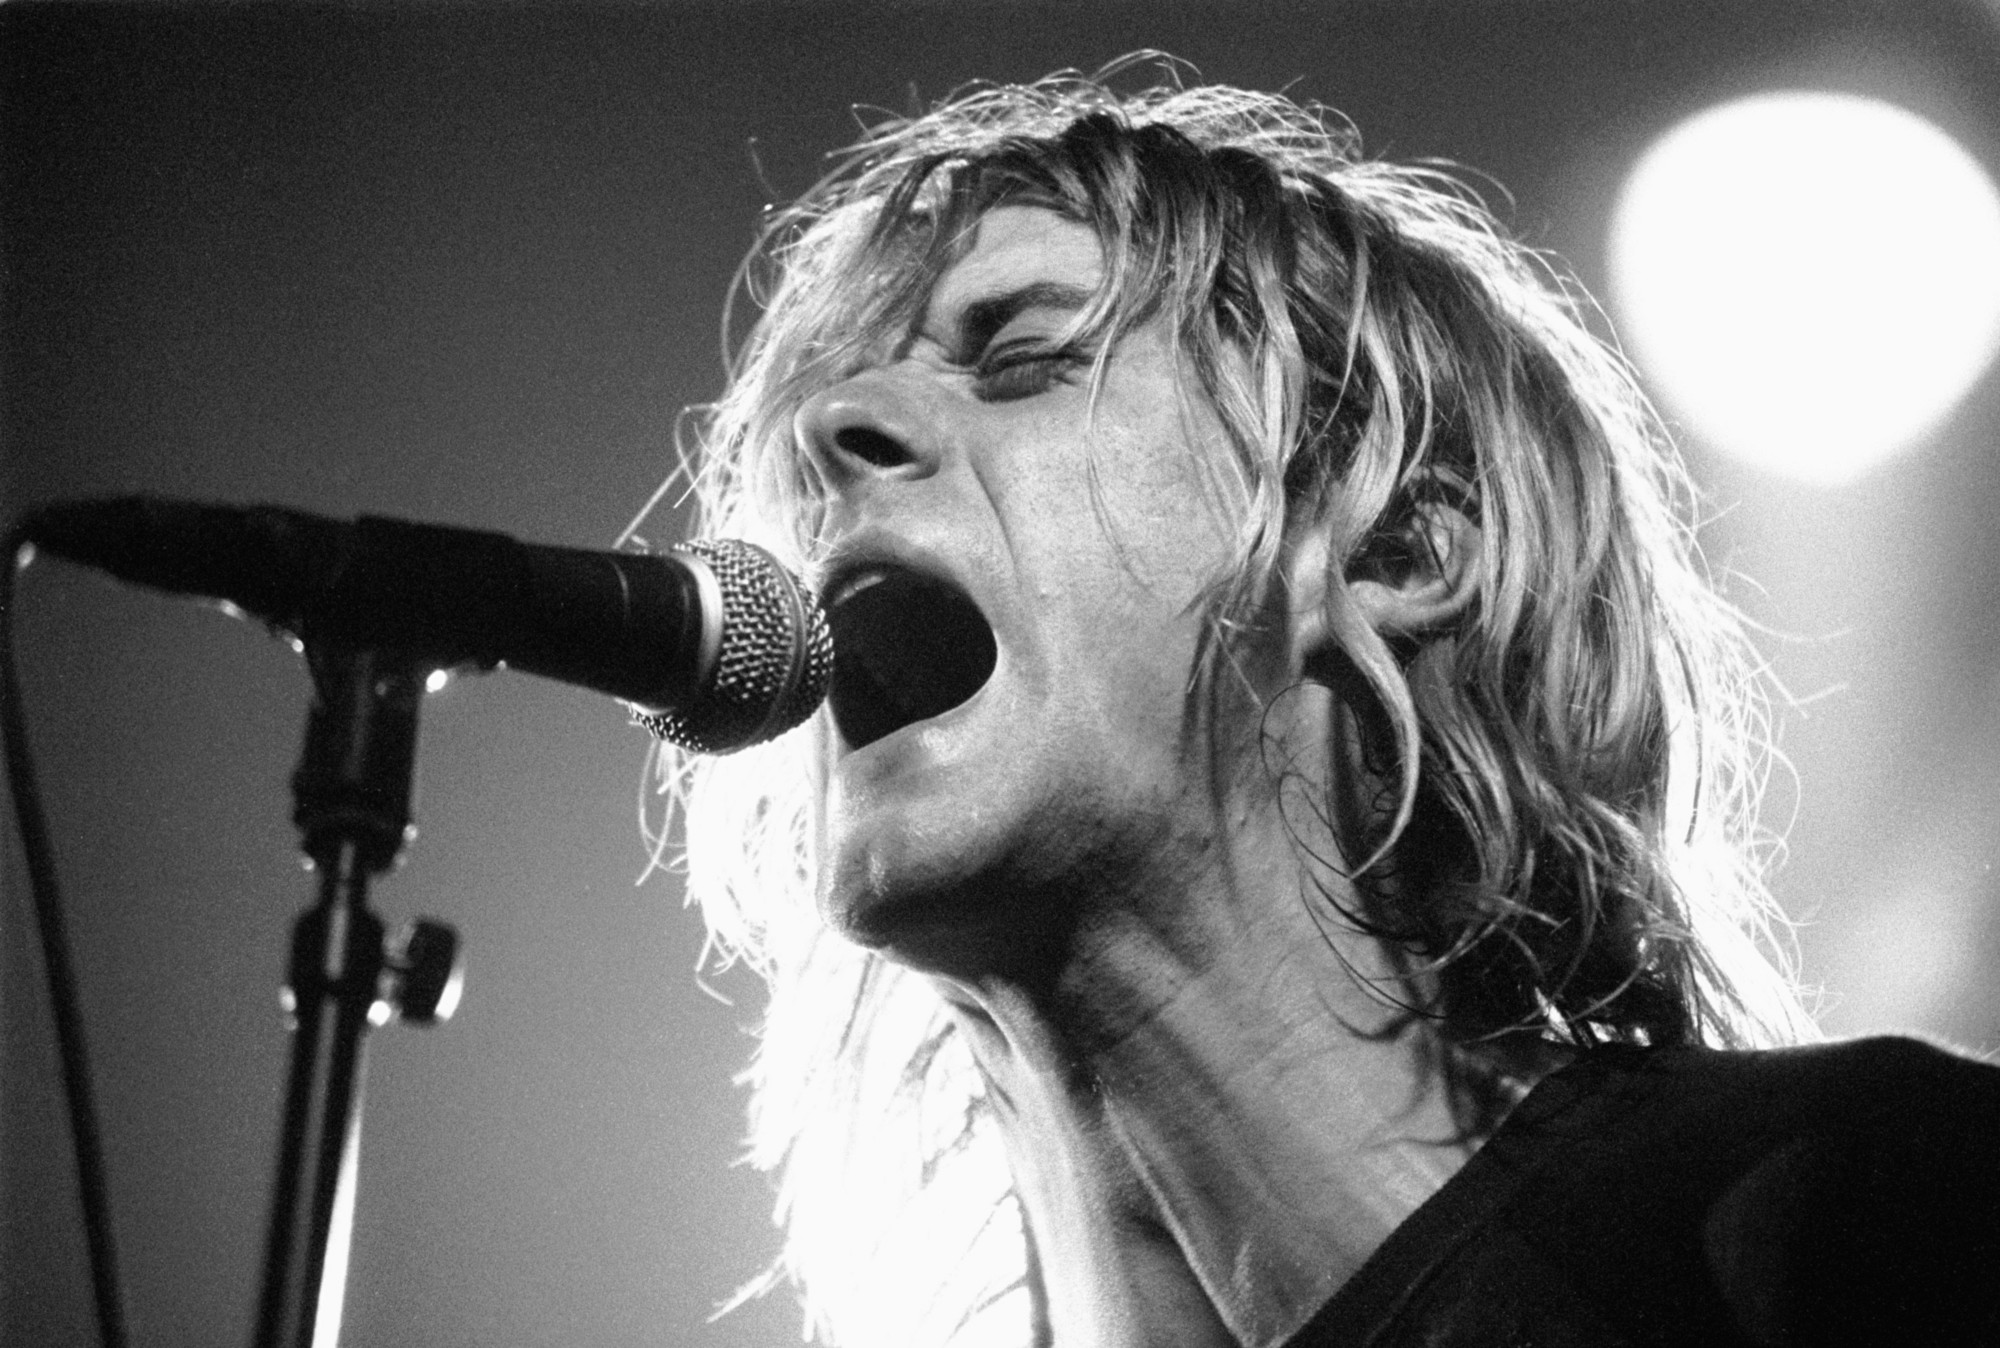 Amigo de Kurt Cobain compartió cuatro canciones inéditas de Nirvana